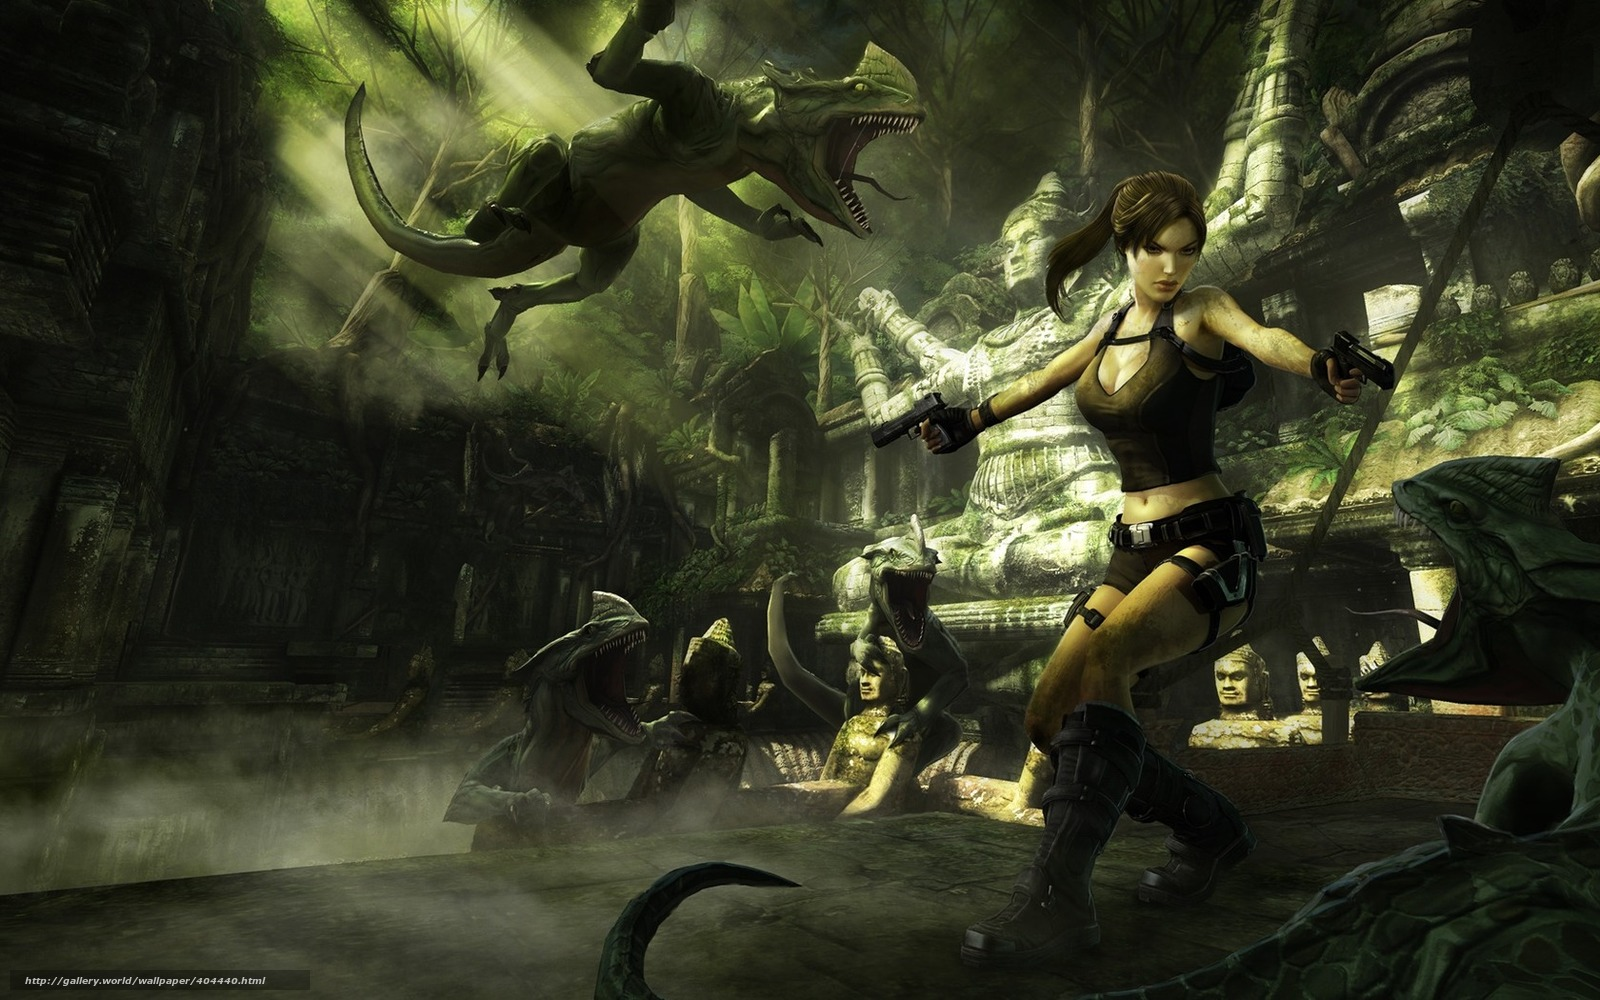 Download wallpaper Lara Croft, Tomb Raider, girl, weapon free desktop ...: www.gdefon.com/download/Lara-Croft_Tomb-Raider_girl_weapon_pangolin...